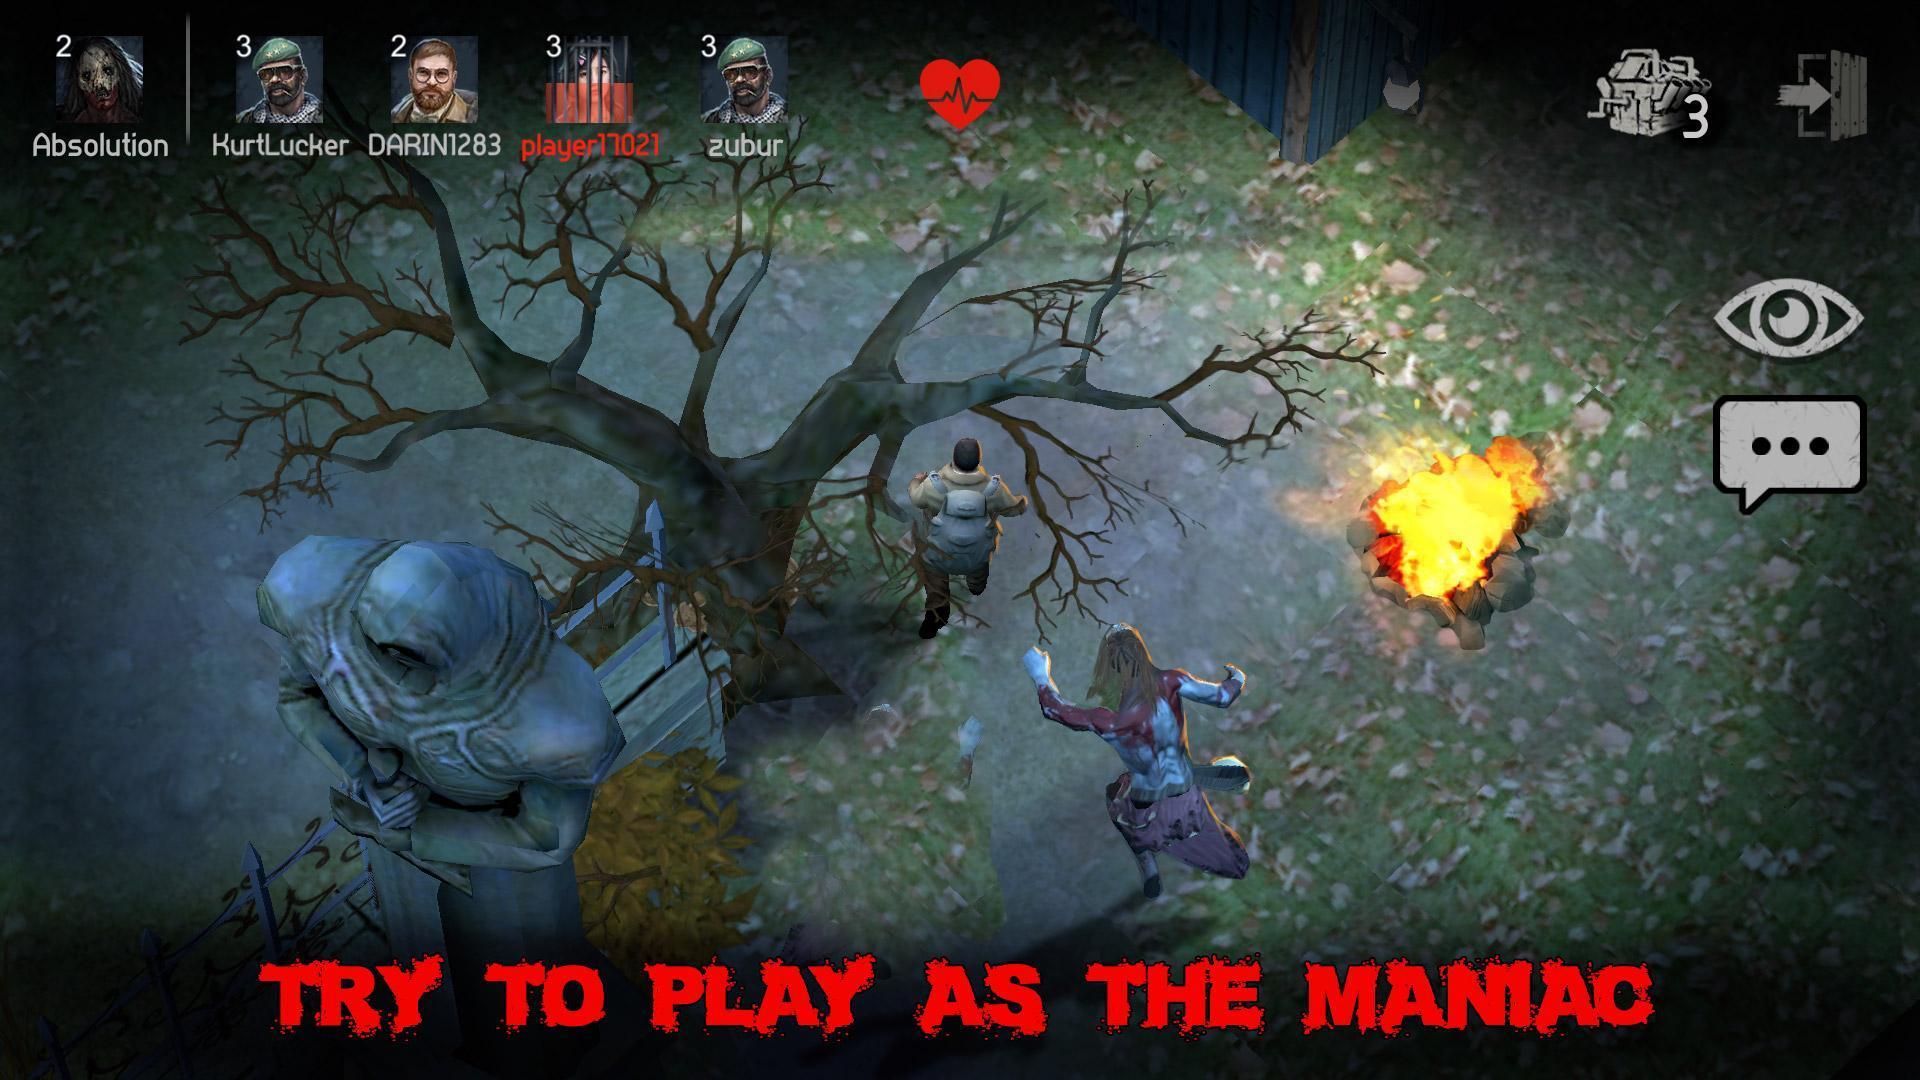 Horrorfield Multiplayer Survival Horror Game 1.3.6 Screenshot 5